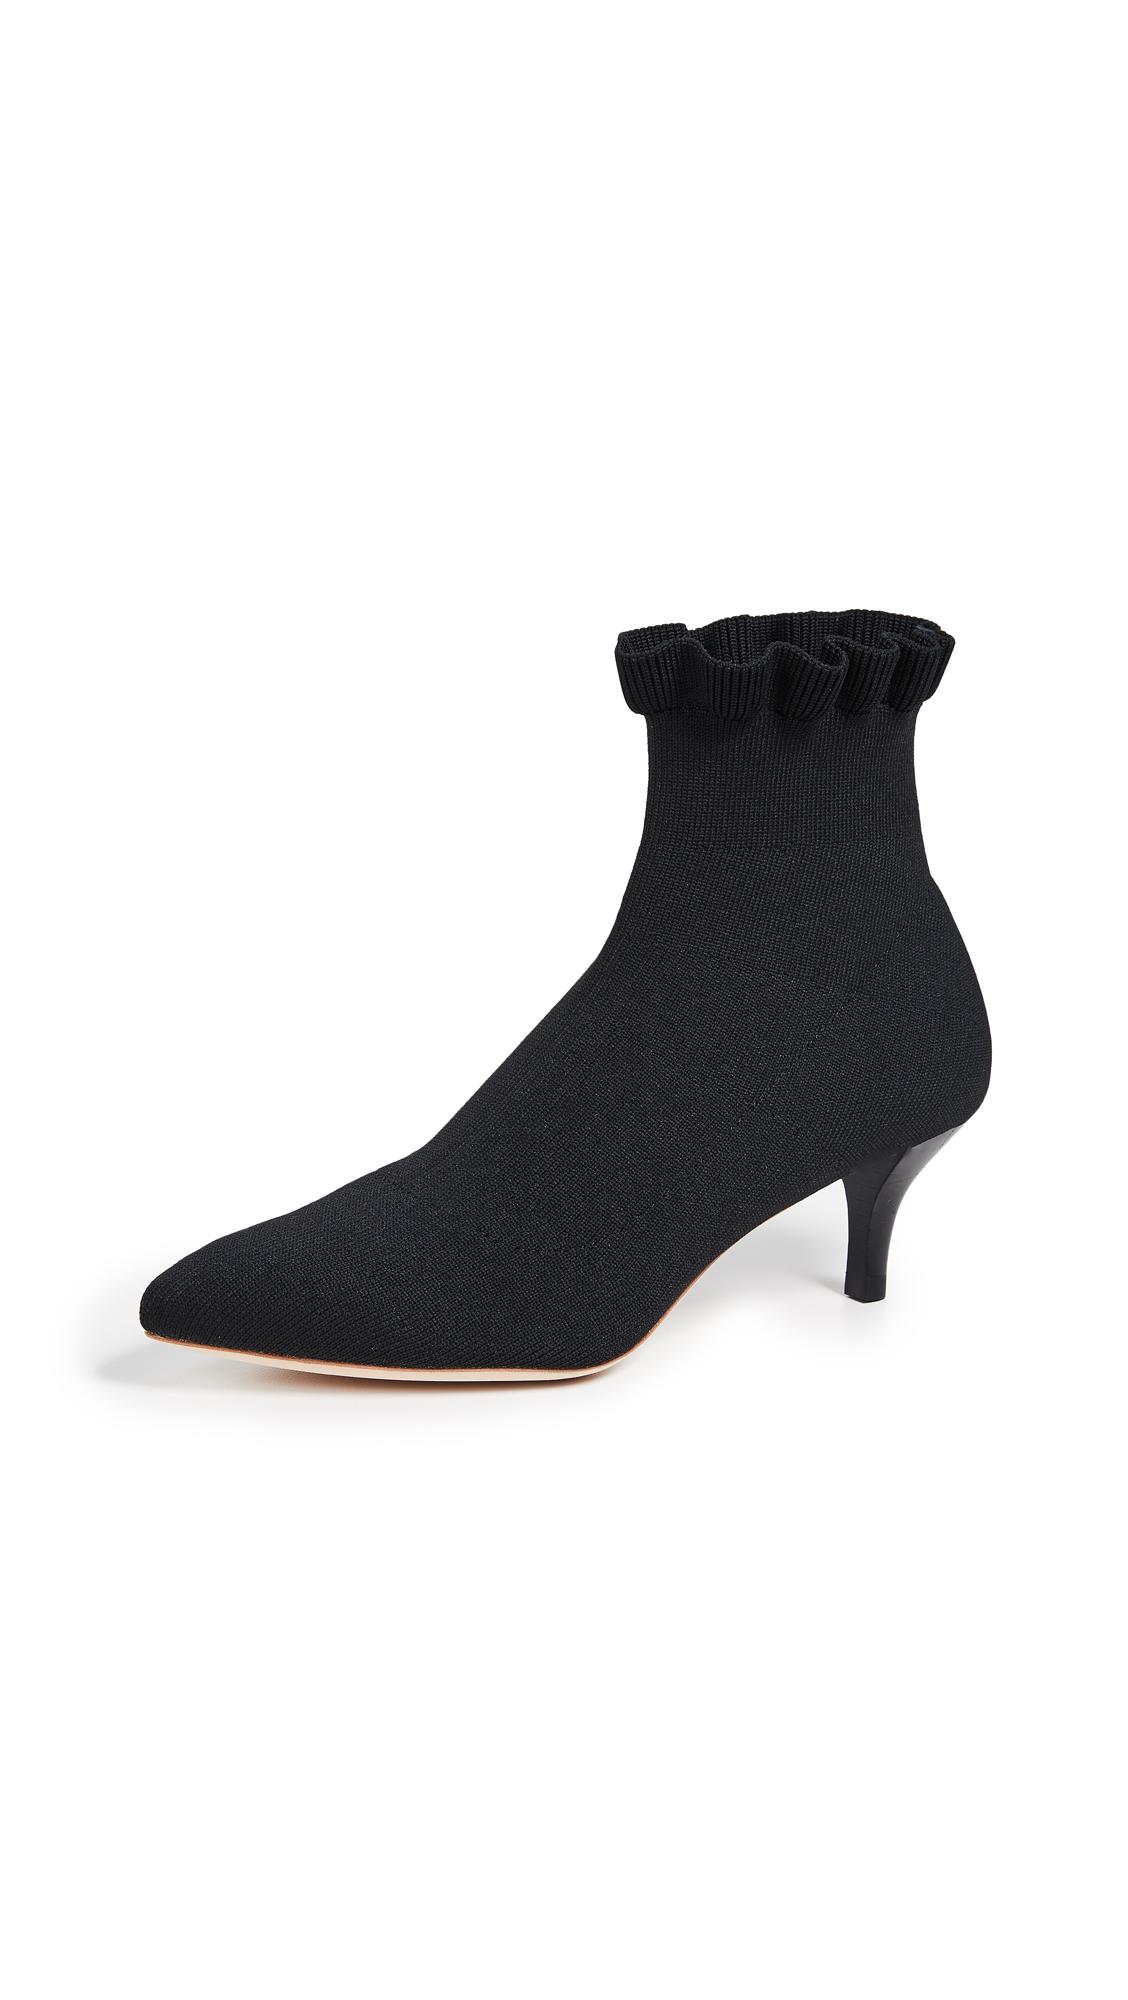 Loeffler Randall Kassidy Stretch Low Heel Booties - Black